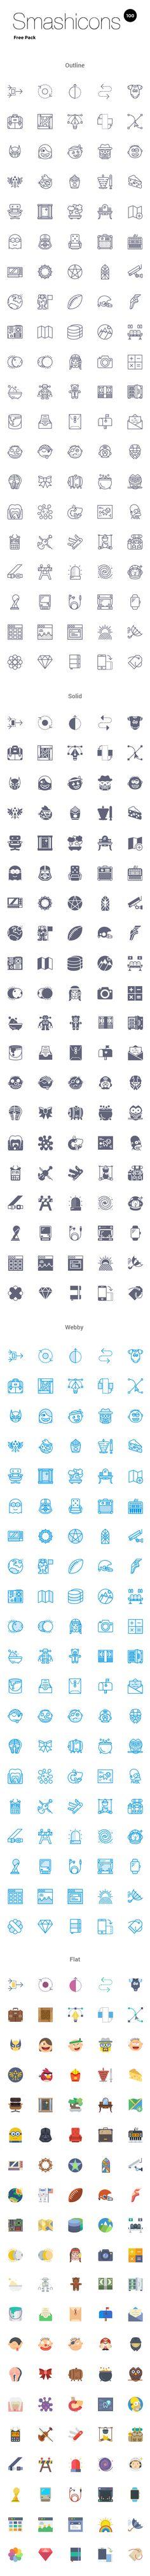 Smashicons: 100 Free Icons | GraphicBurger